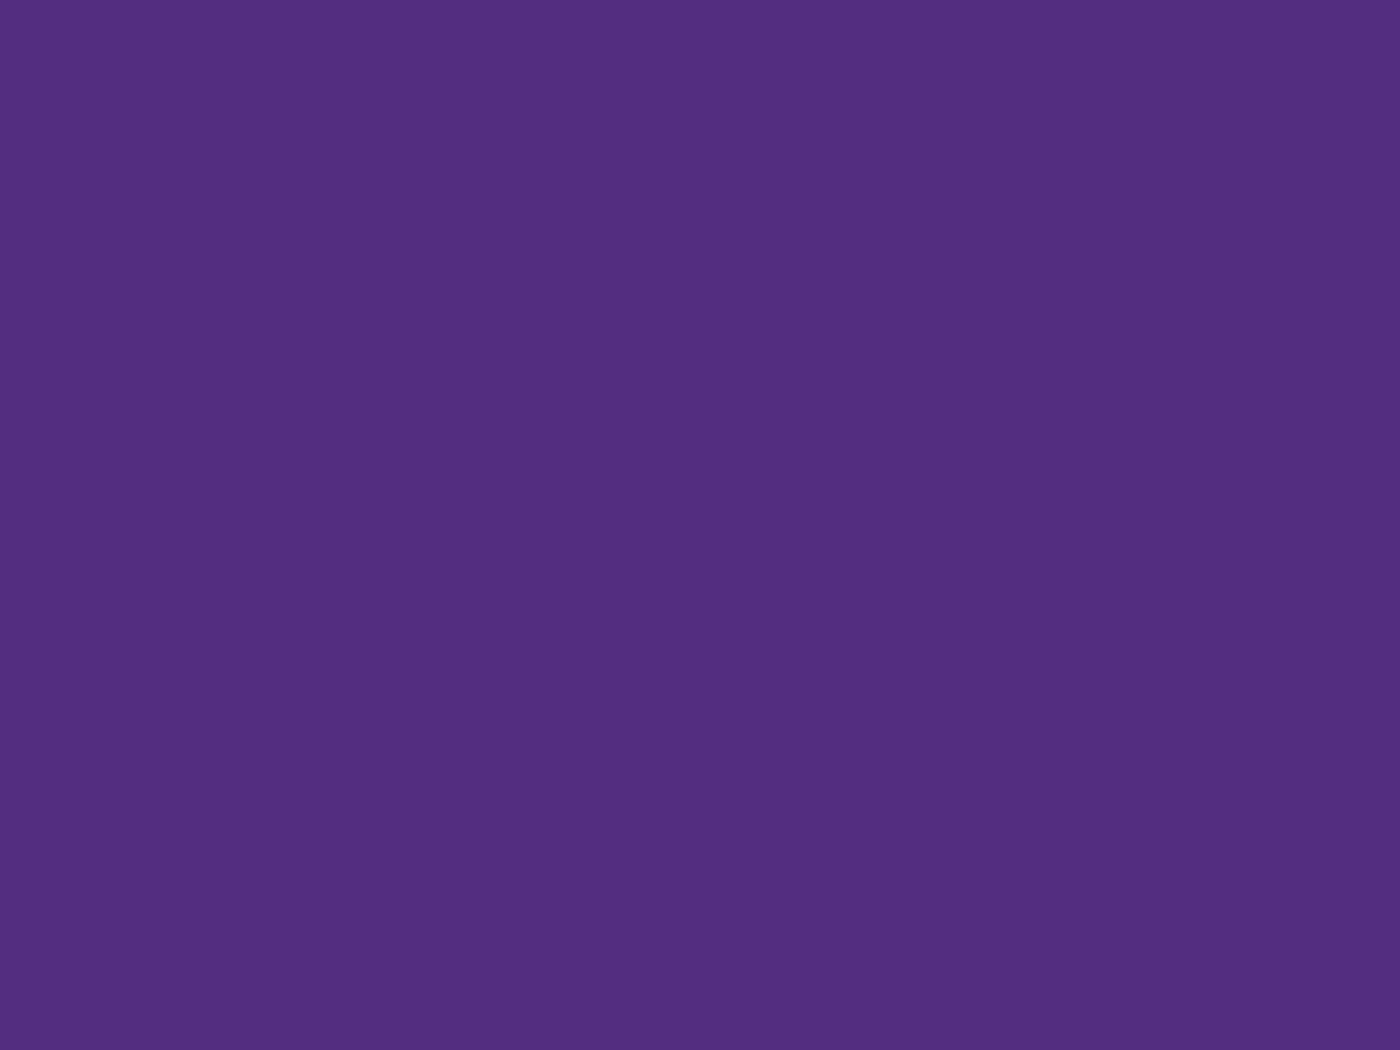 1400x1050 Regalia Solid Color Background